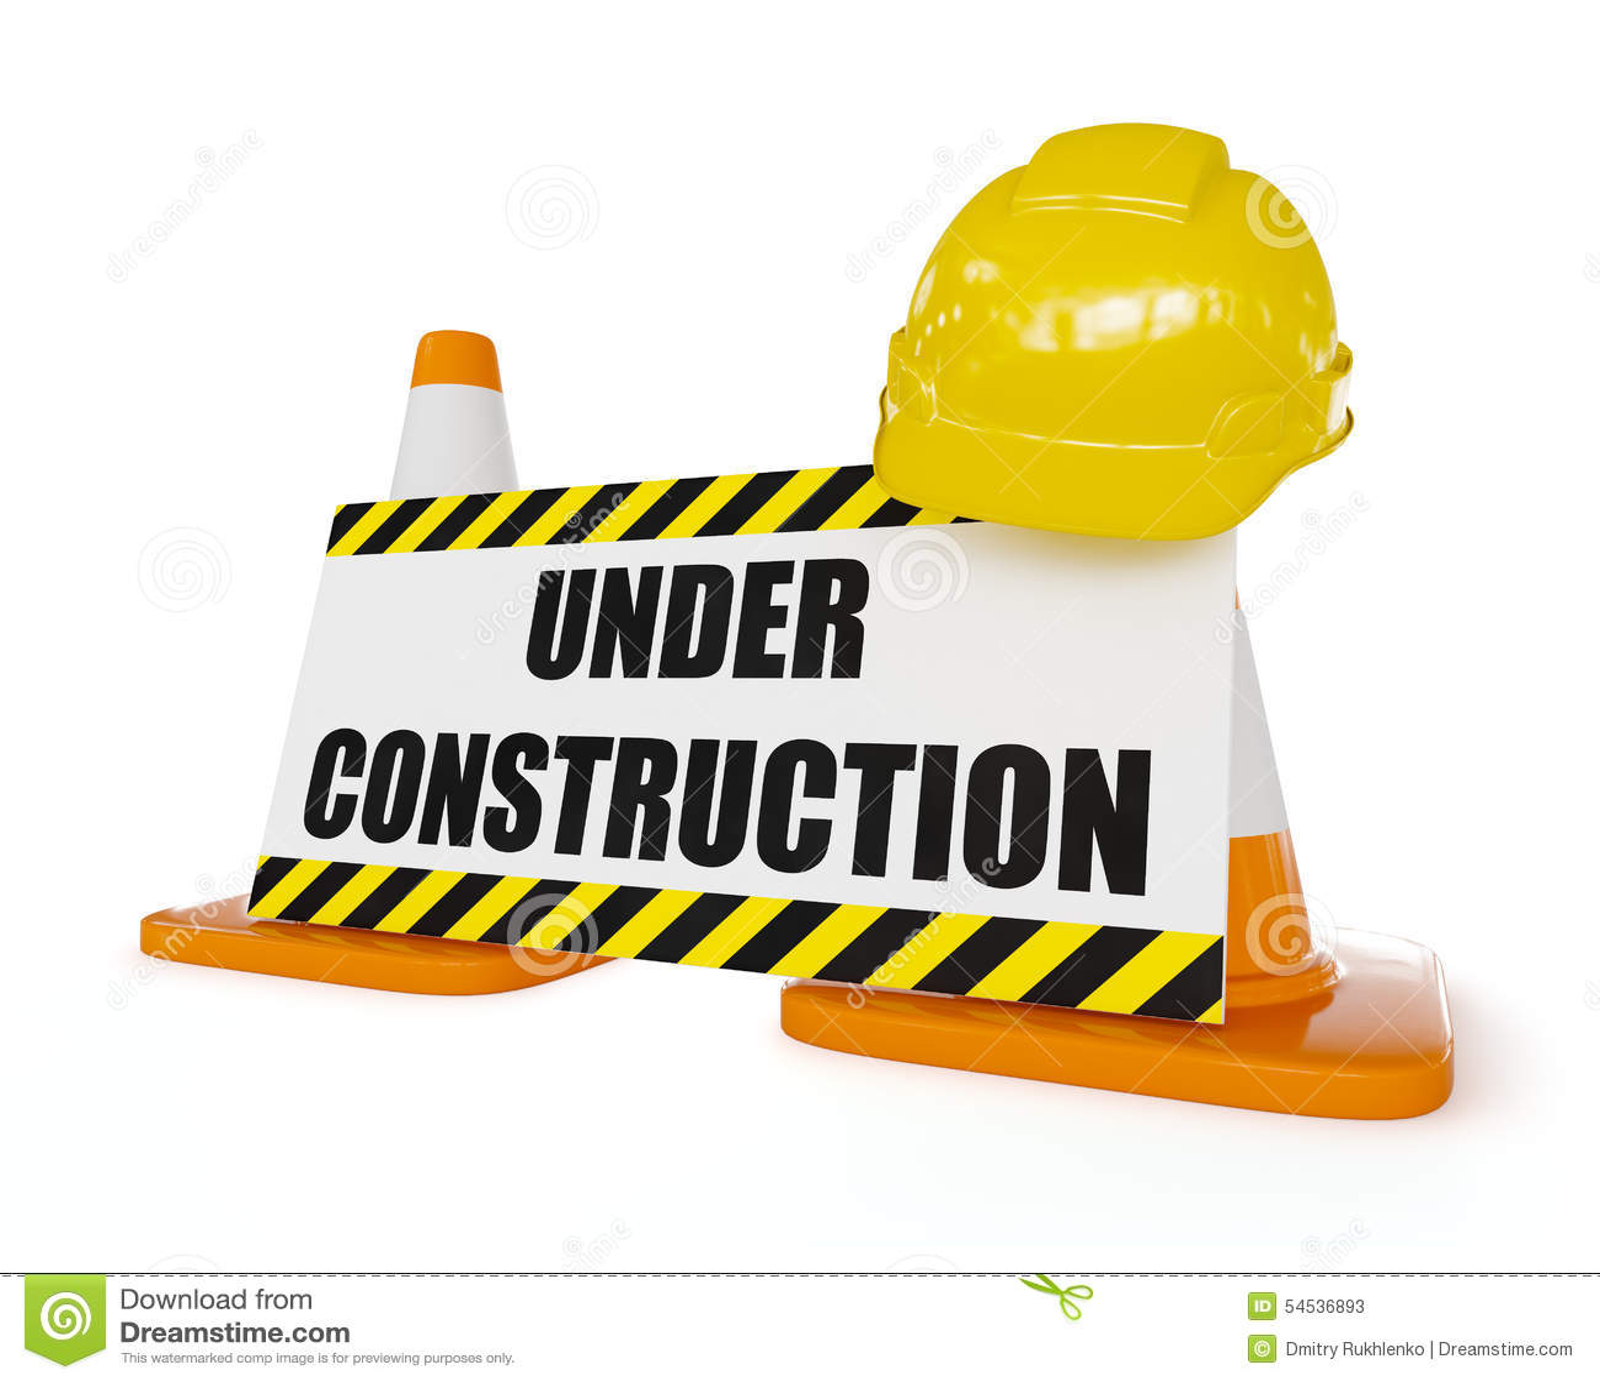 Image Result For Orange Construction Cones